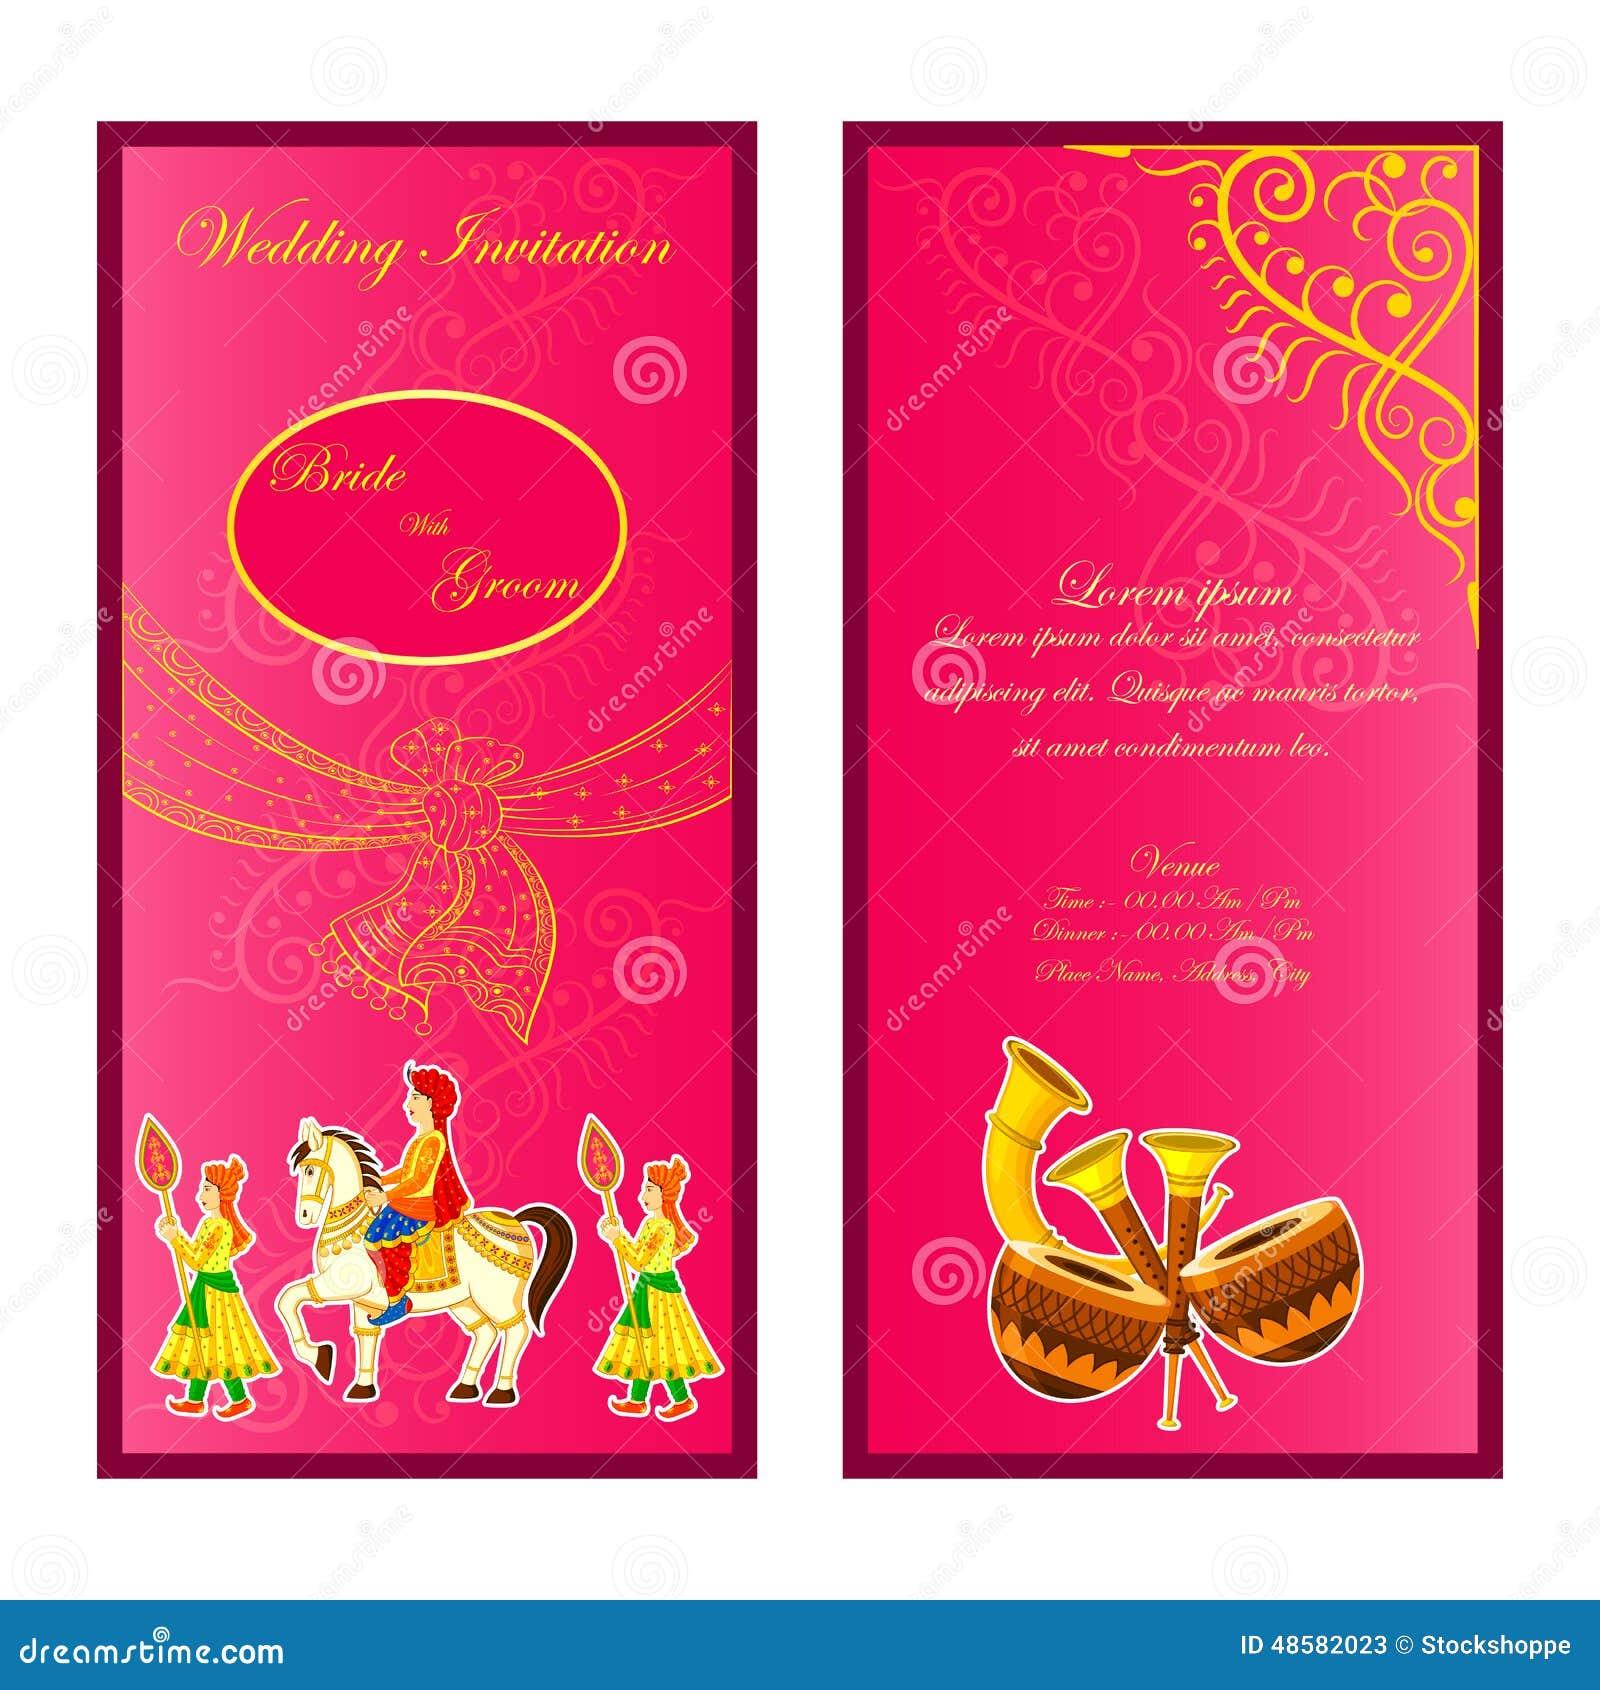 Indian Wedding Invitation Card Stock Vector - Image: 48582023